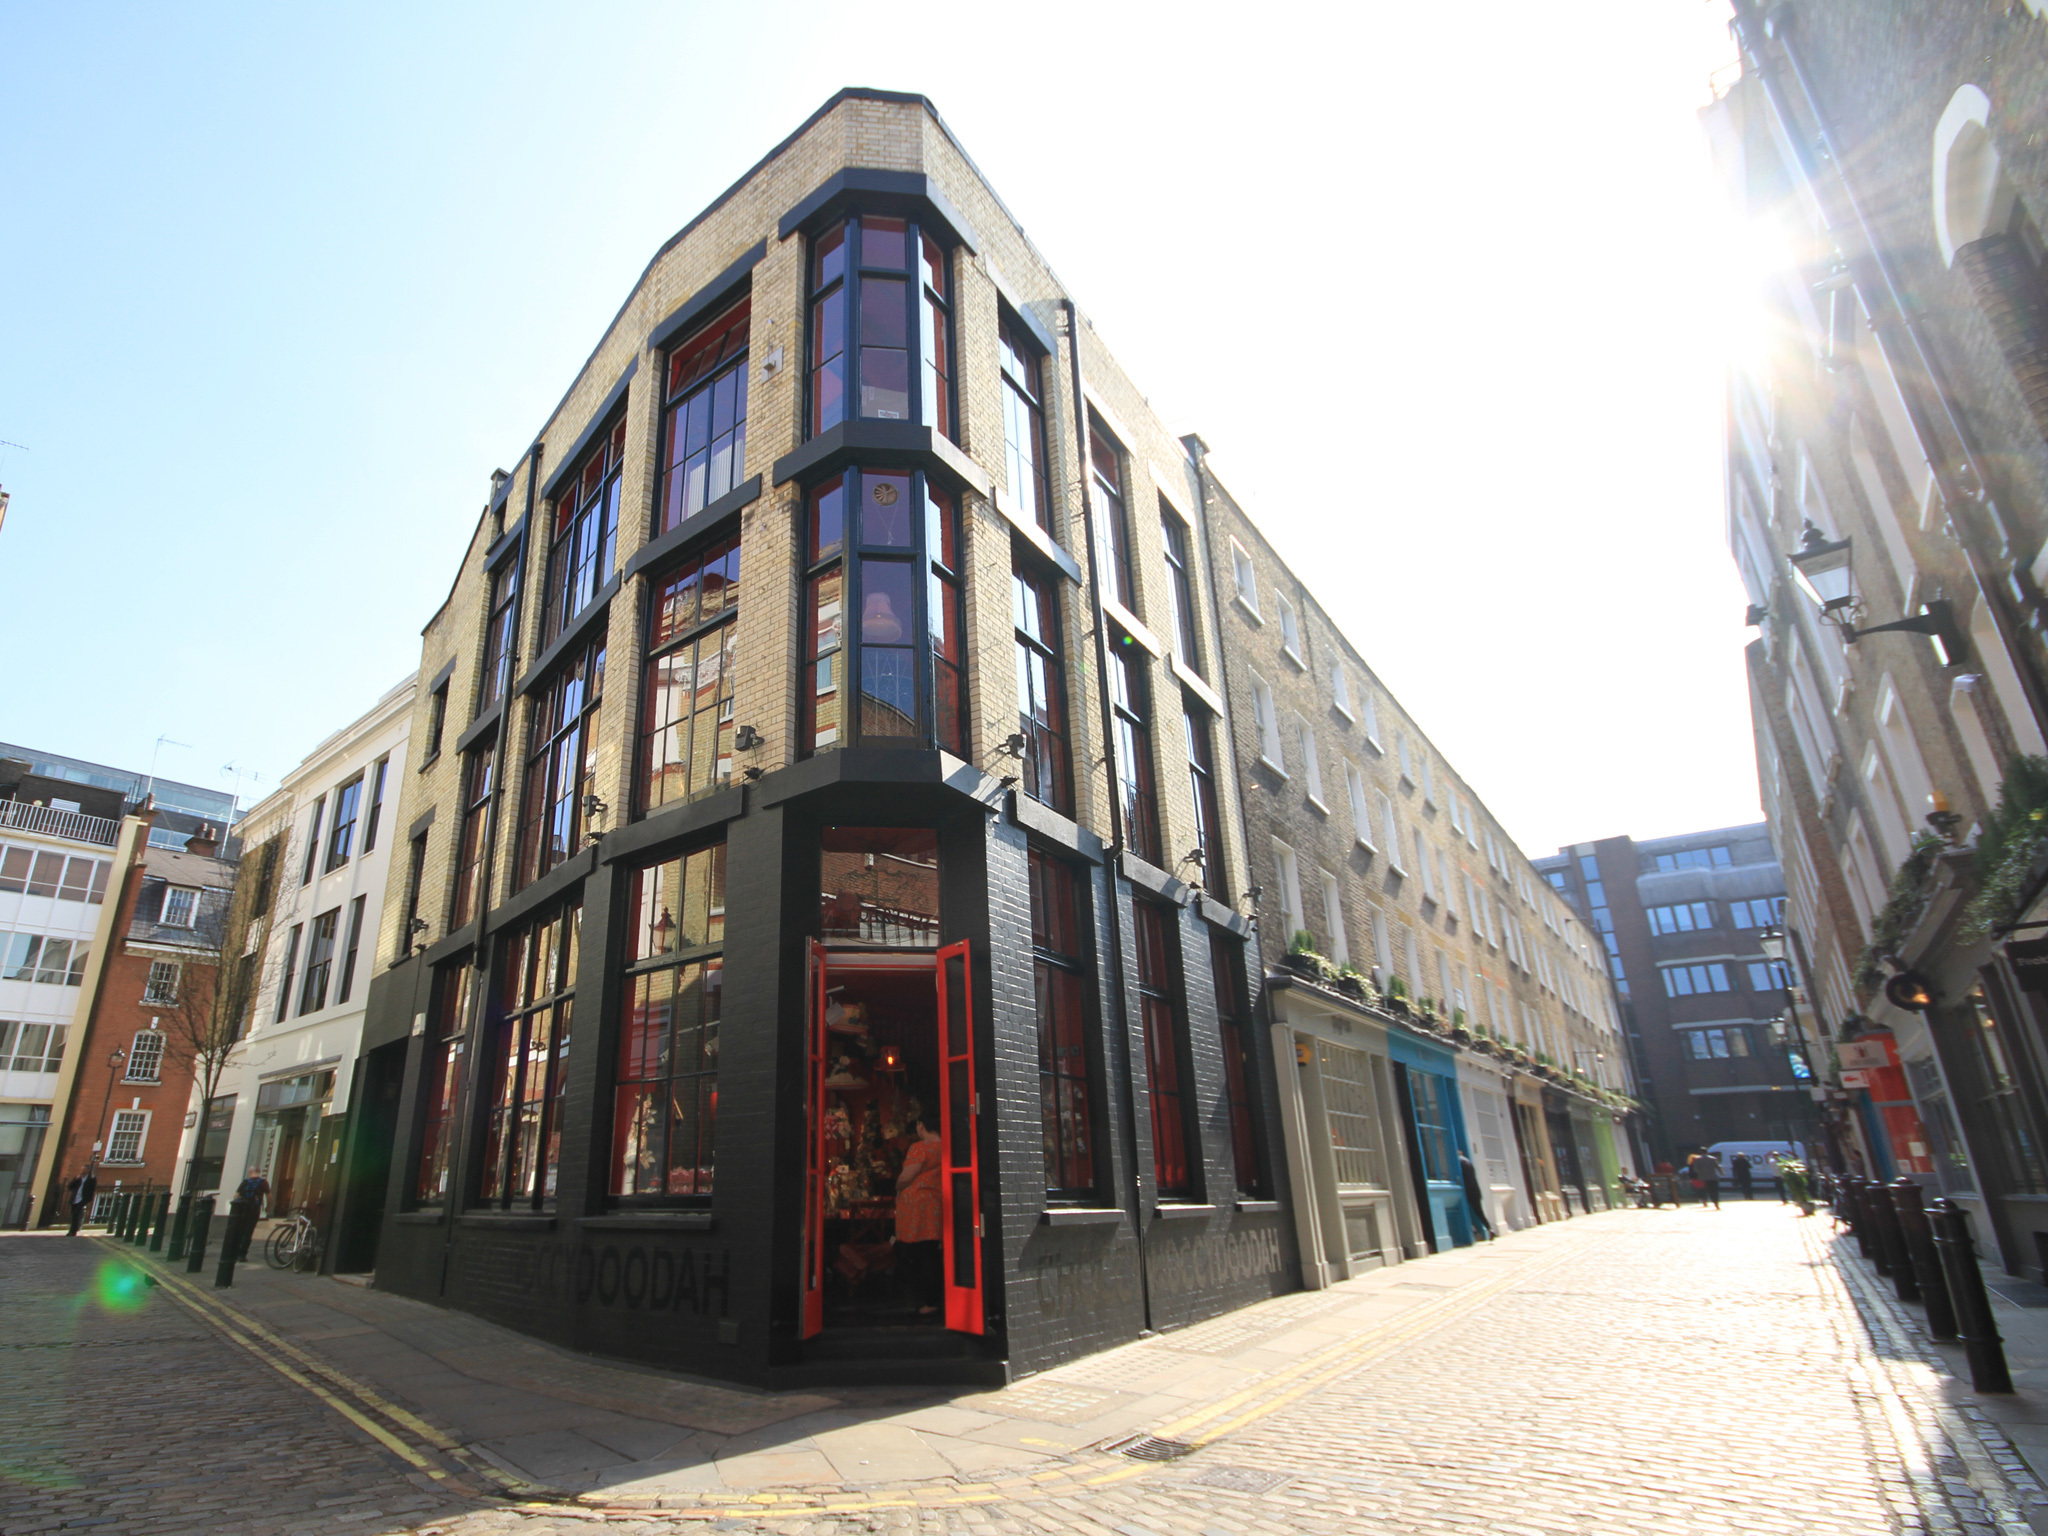 13 awesome things to do on Newburgh Street, Soho